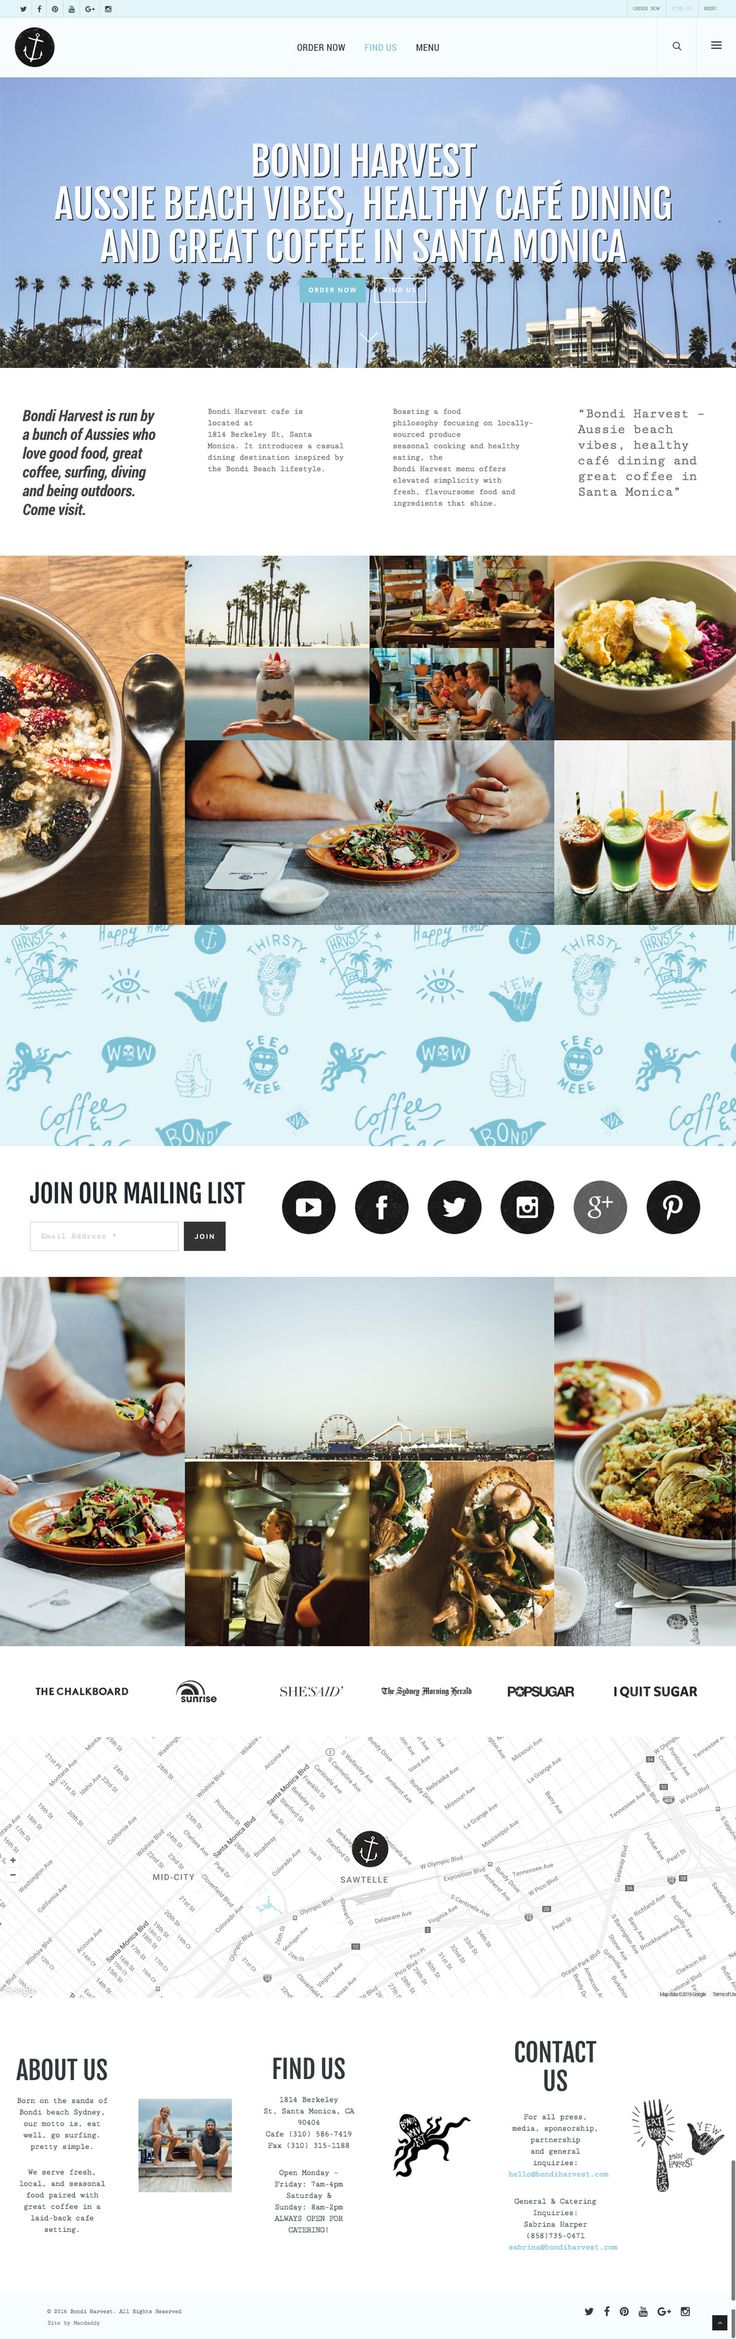 Bondi Harvest Santa Monica Cafe website (website # 2) by KORE (http://kore.digital/). The home of food porn. US site.